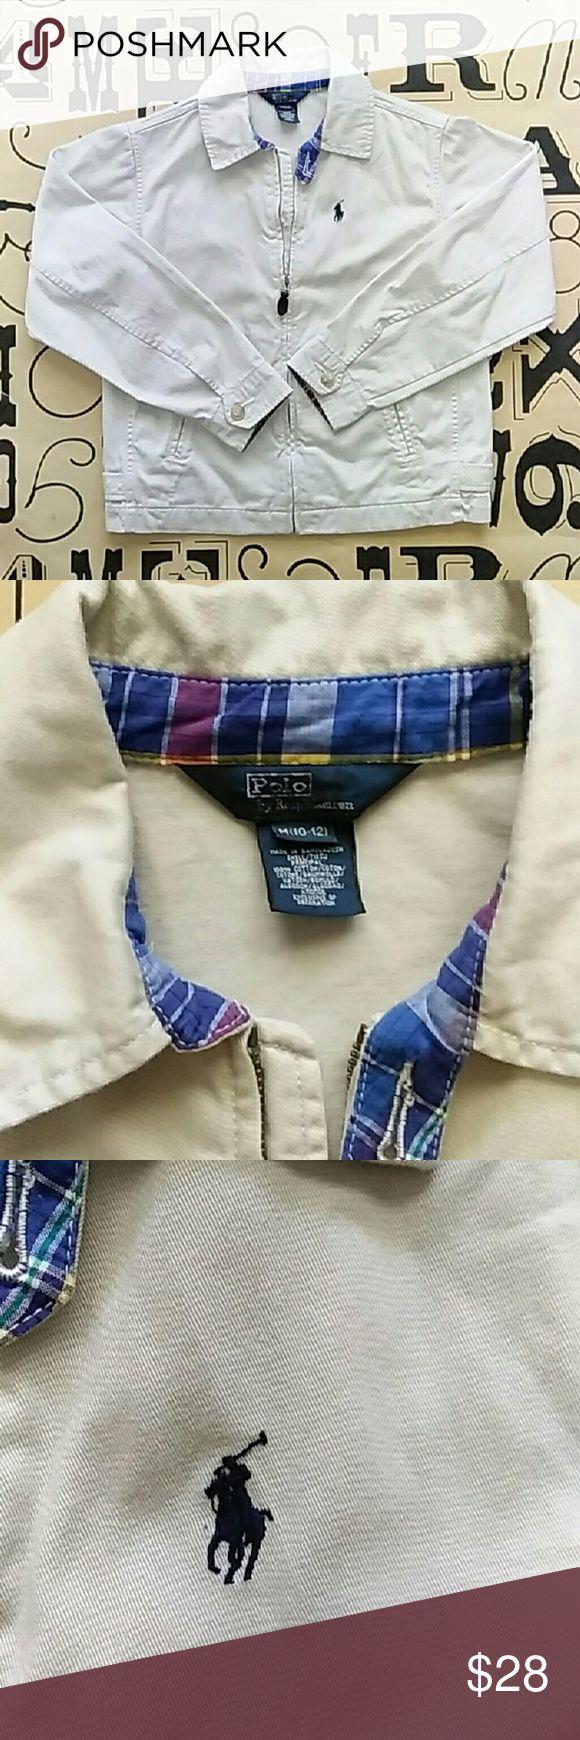 Polo by Ralph Lauren kids khaki jacket Gently used Polo by Ralph Lauren kids khaki jacket size medium 10/12 Polo by Ralph Lauren Jackets & Coats